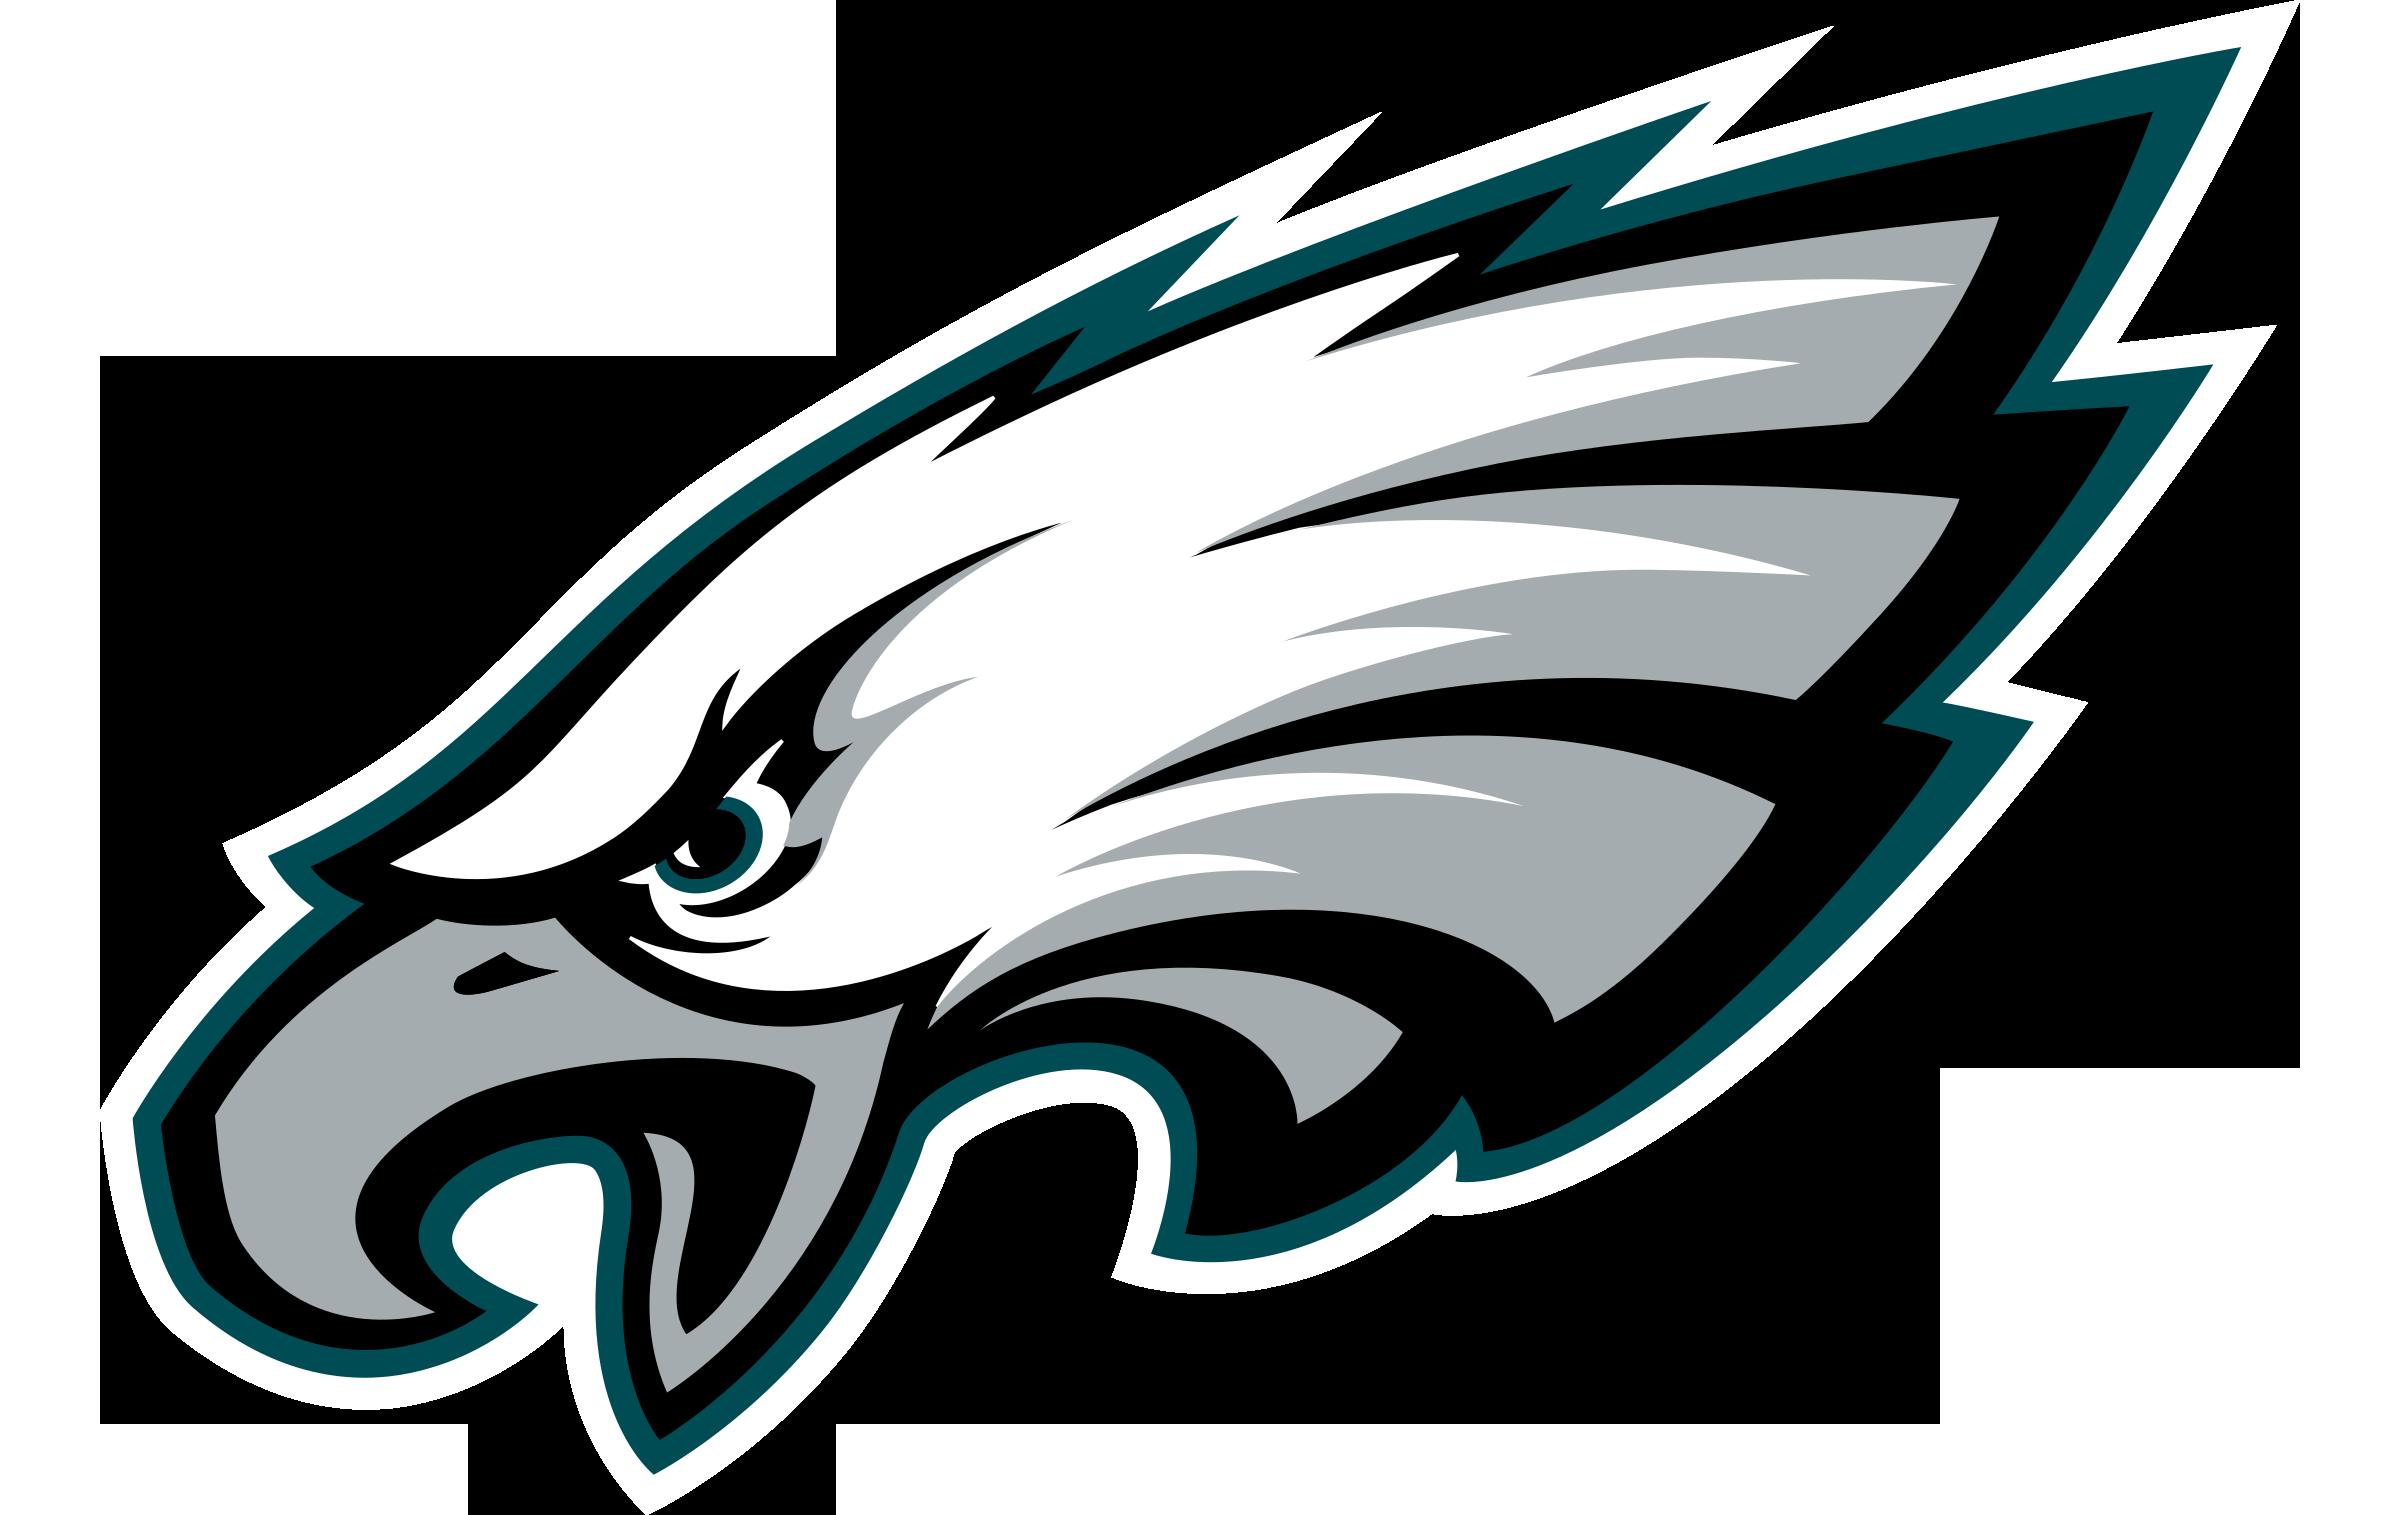 Eagles clipart fierce, Eagles fierce Transparent FREE for.